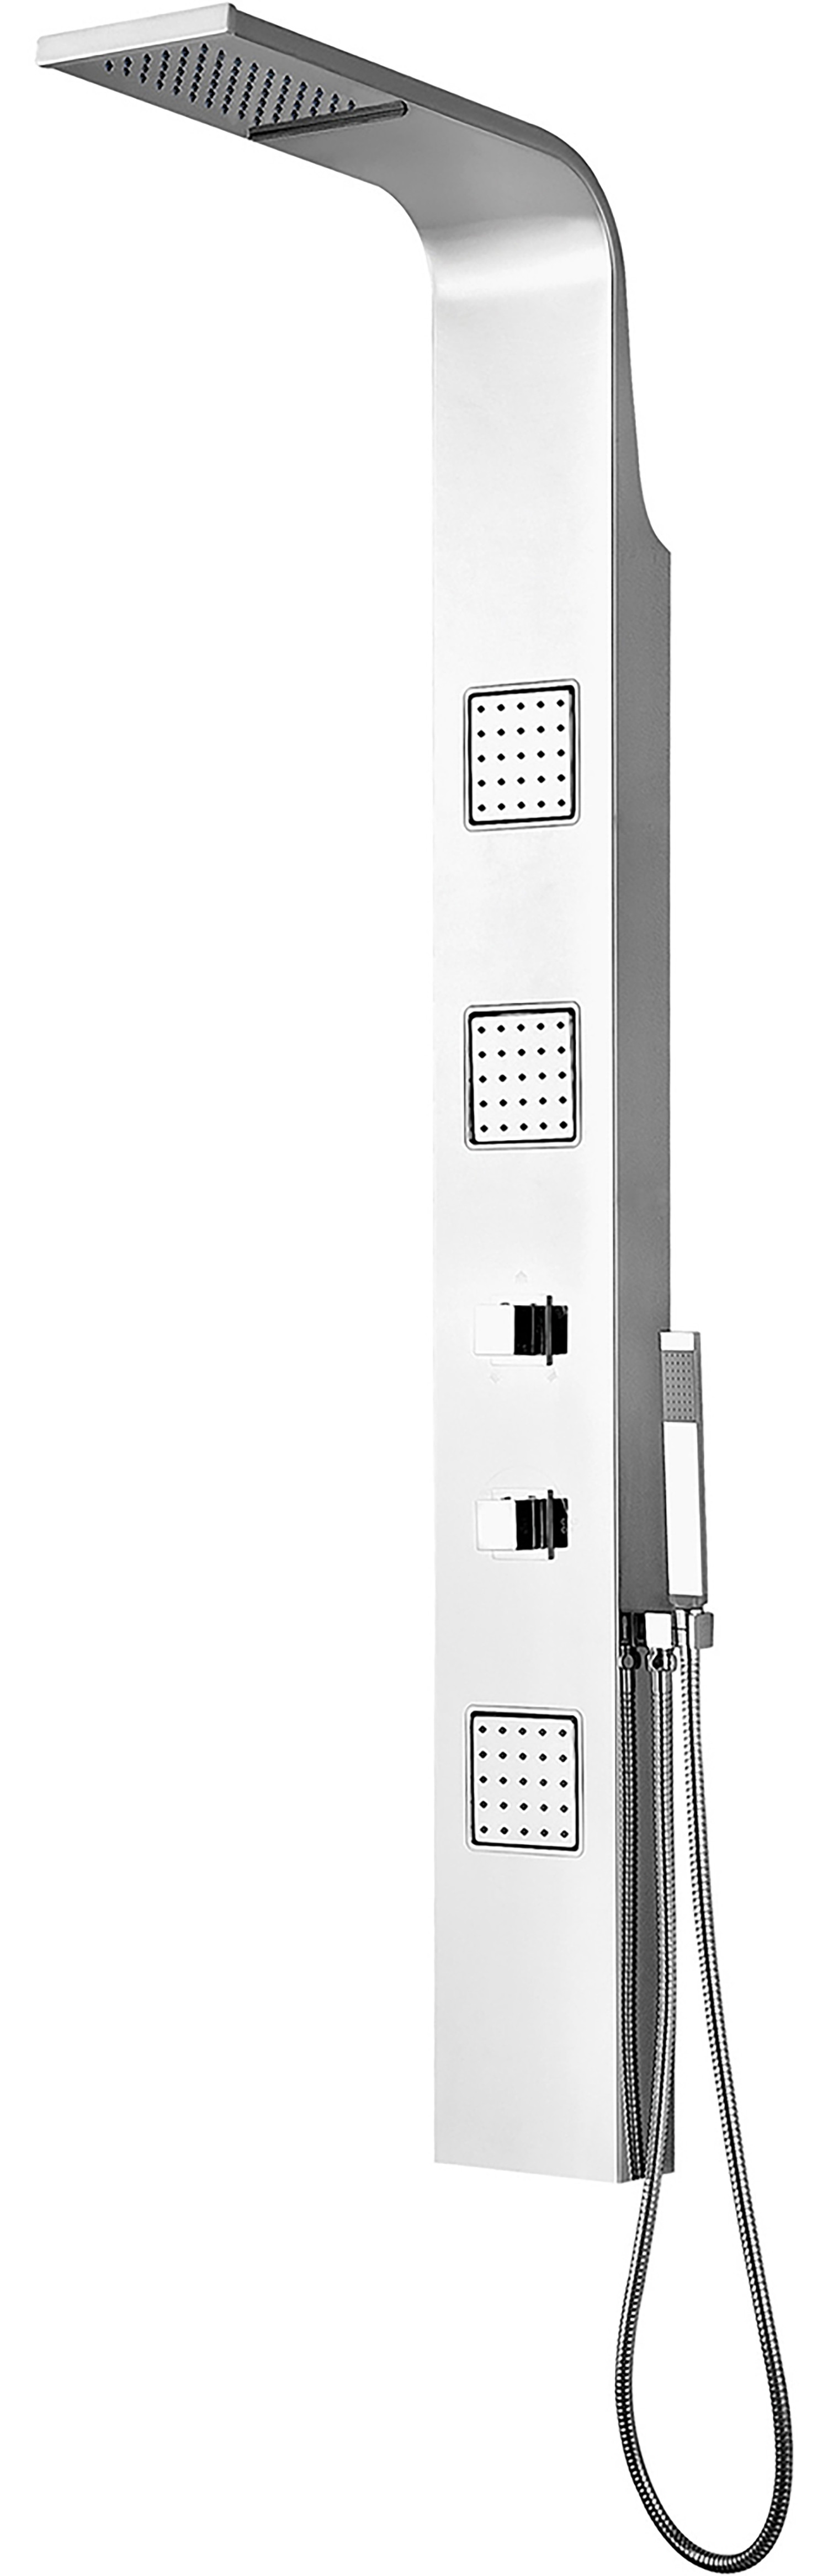 Pano Shower Panel